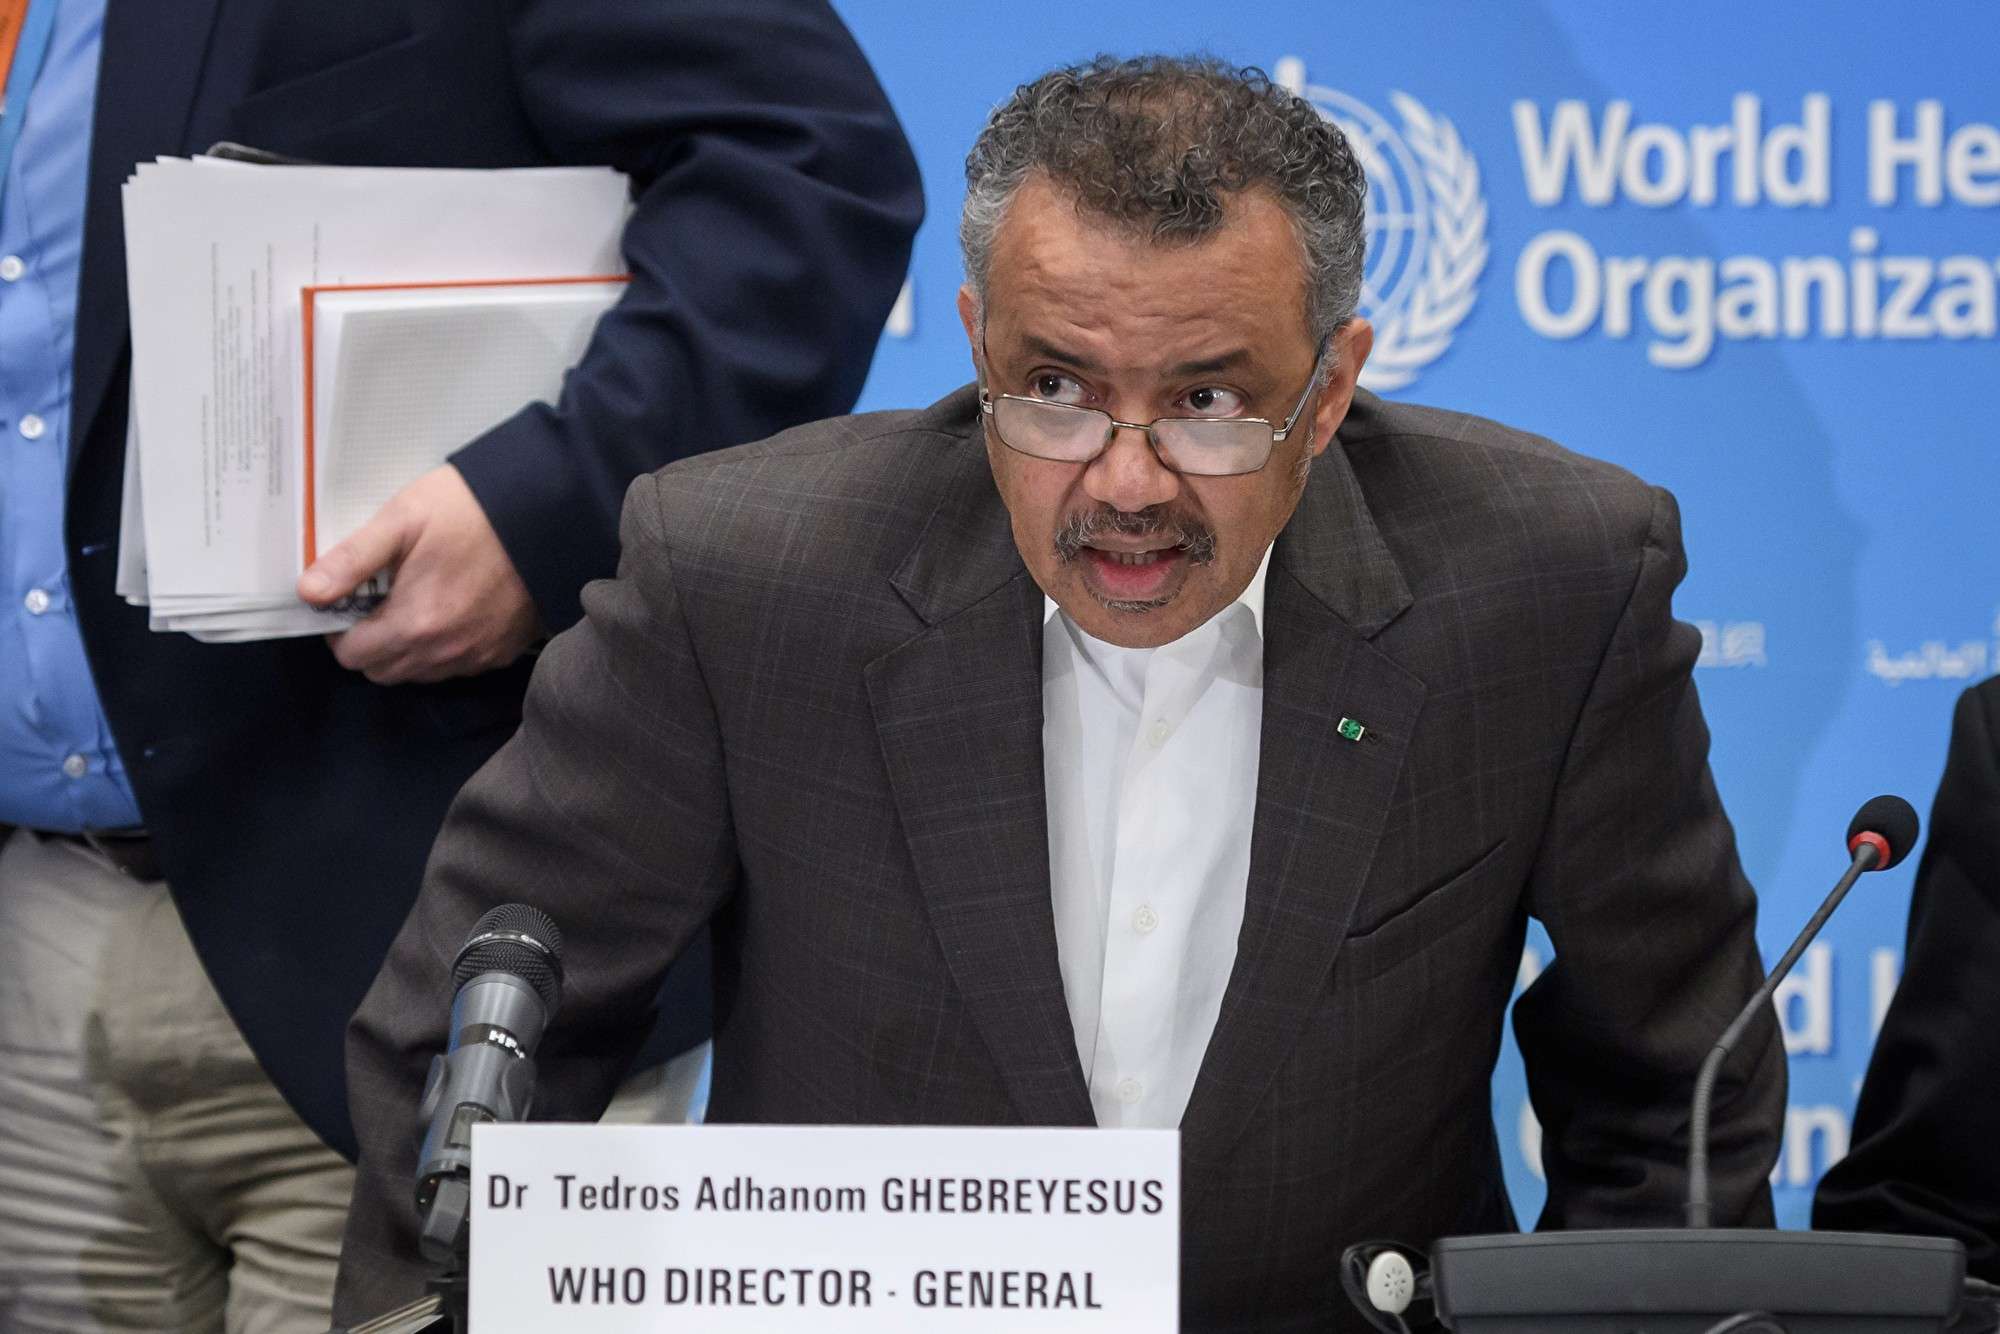 圖為世界衛生組織(WHO)秘書長譚德塞(Tedros Adhanom Ghebreyesus)。(攝於2020年1月30日)(FABRICE COFFRINI / AFP)